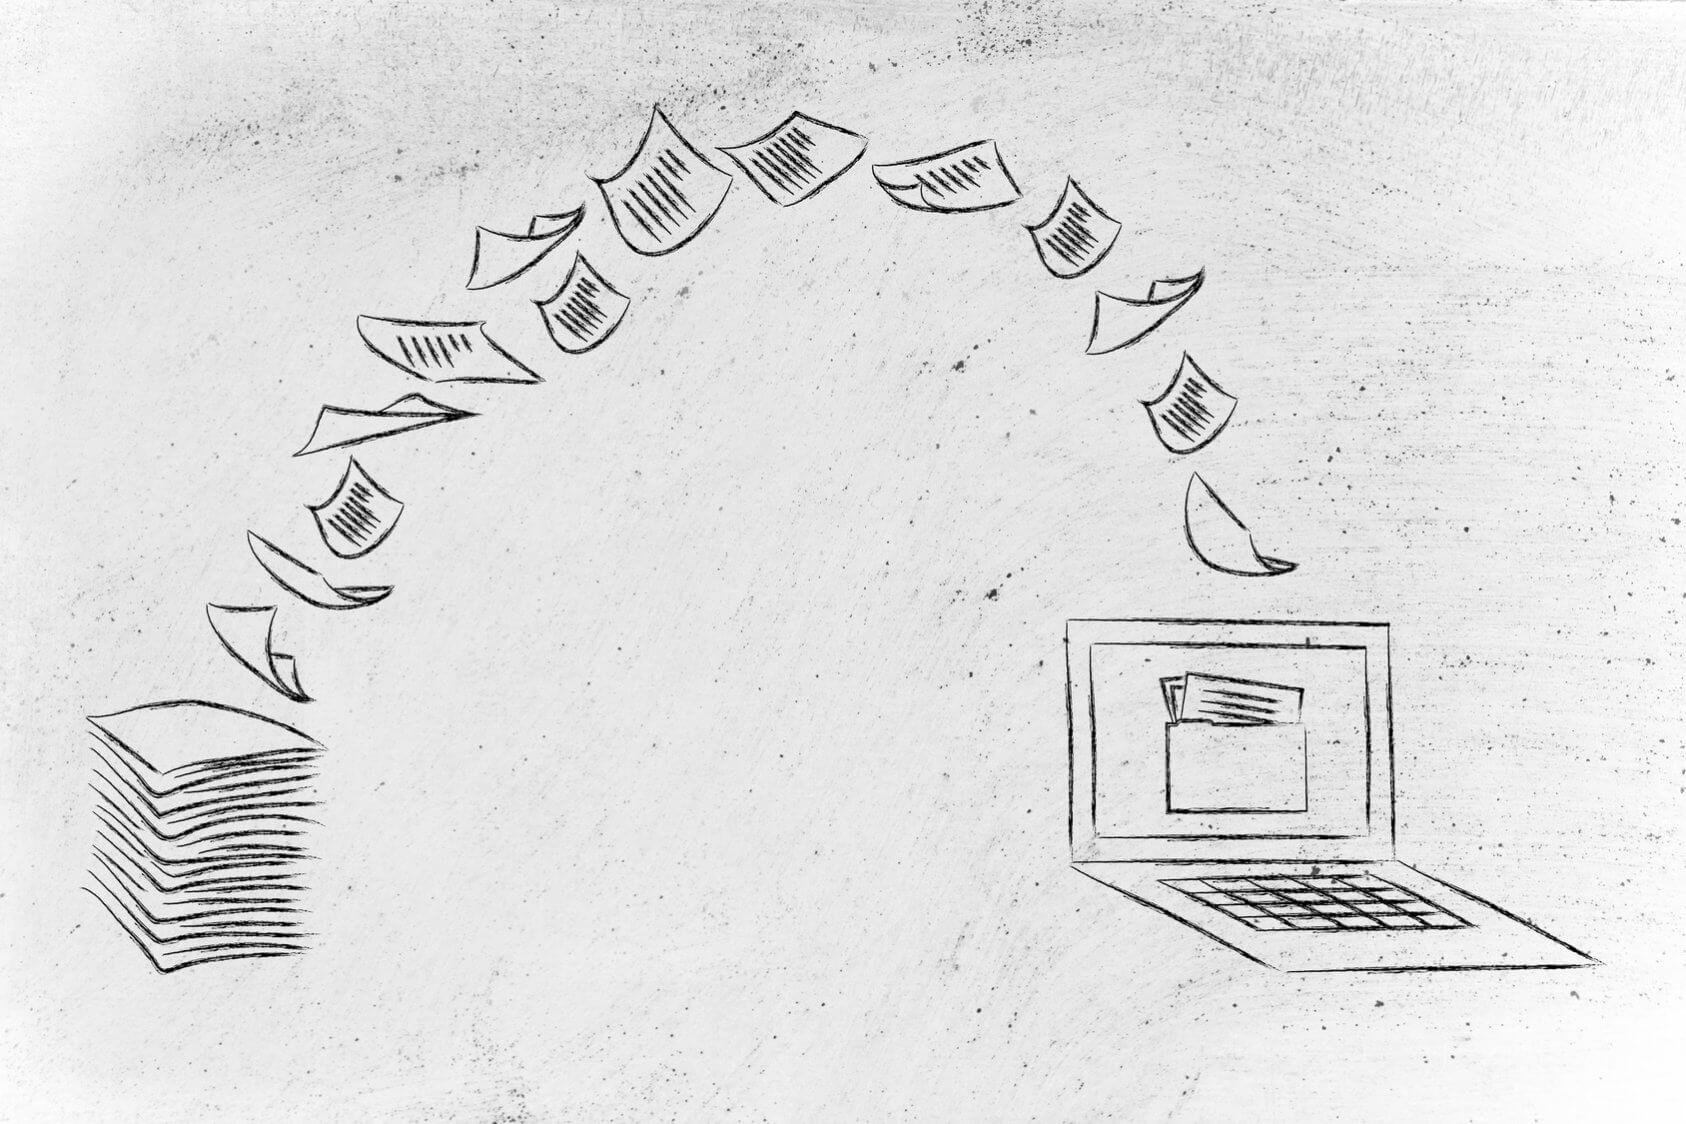 Digitaler Wandel - Buchführung 4.0